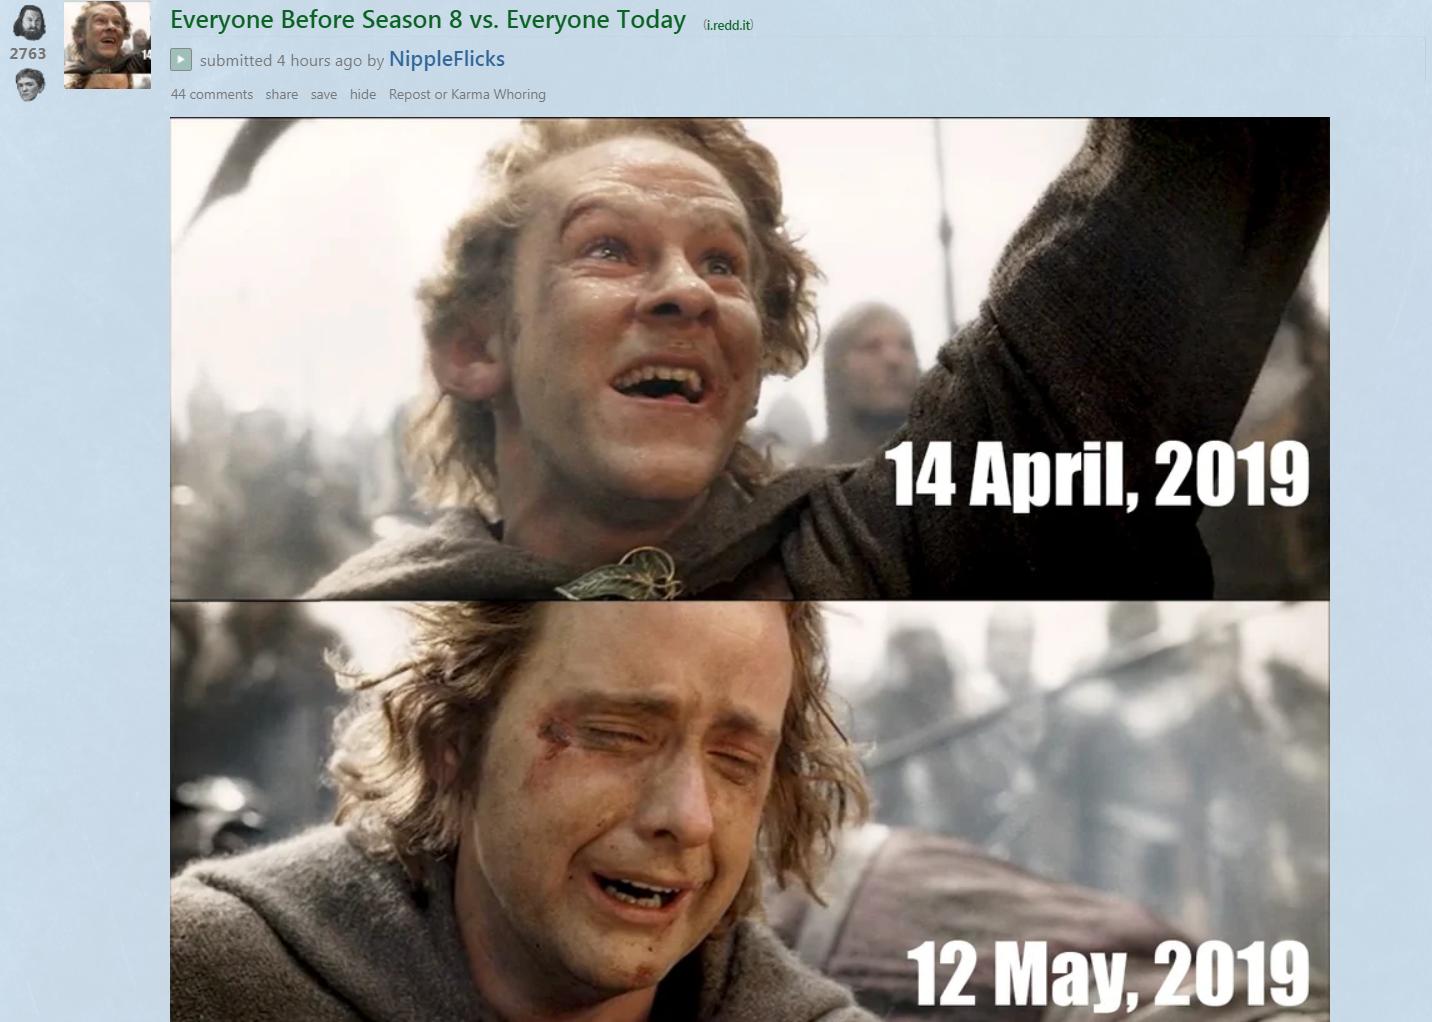 Memes, reactions to 'Game of Thrones' season 8, episode 5